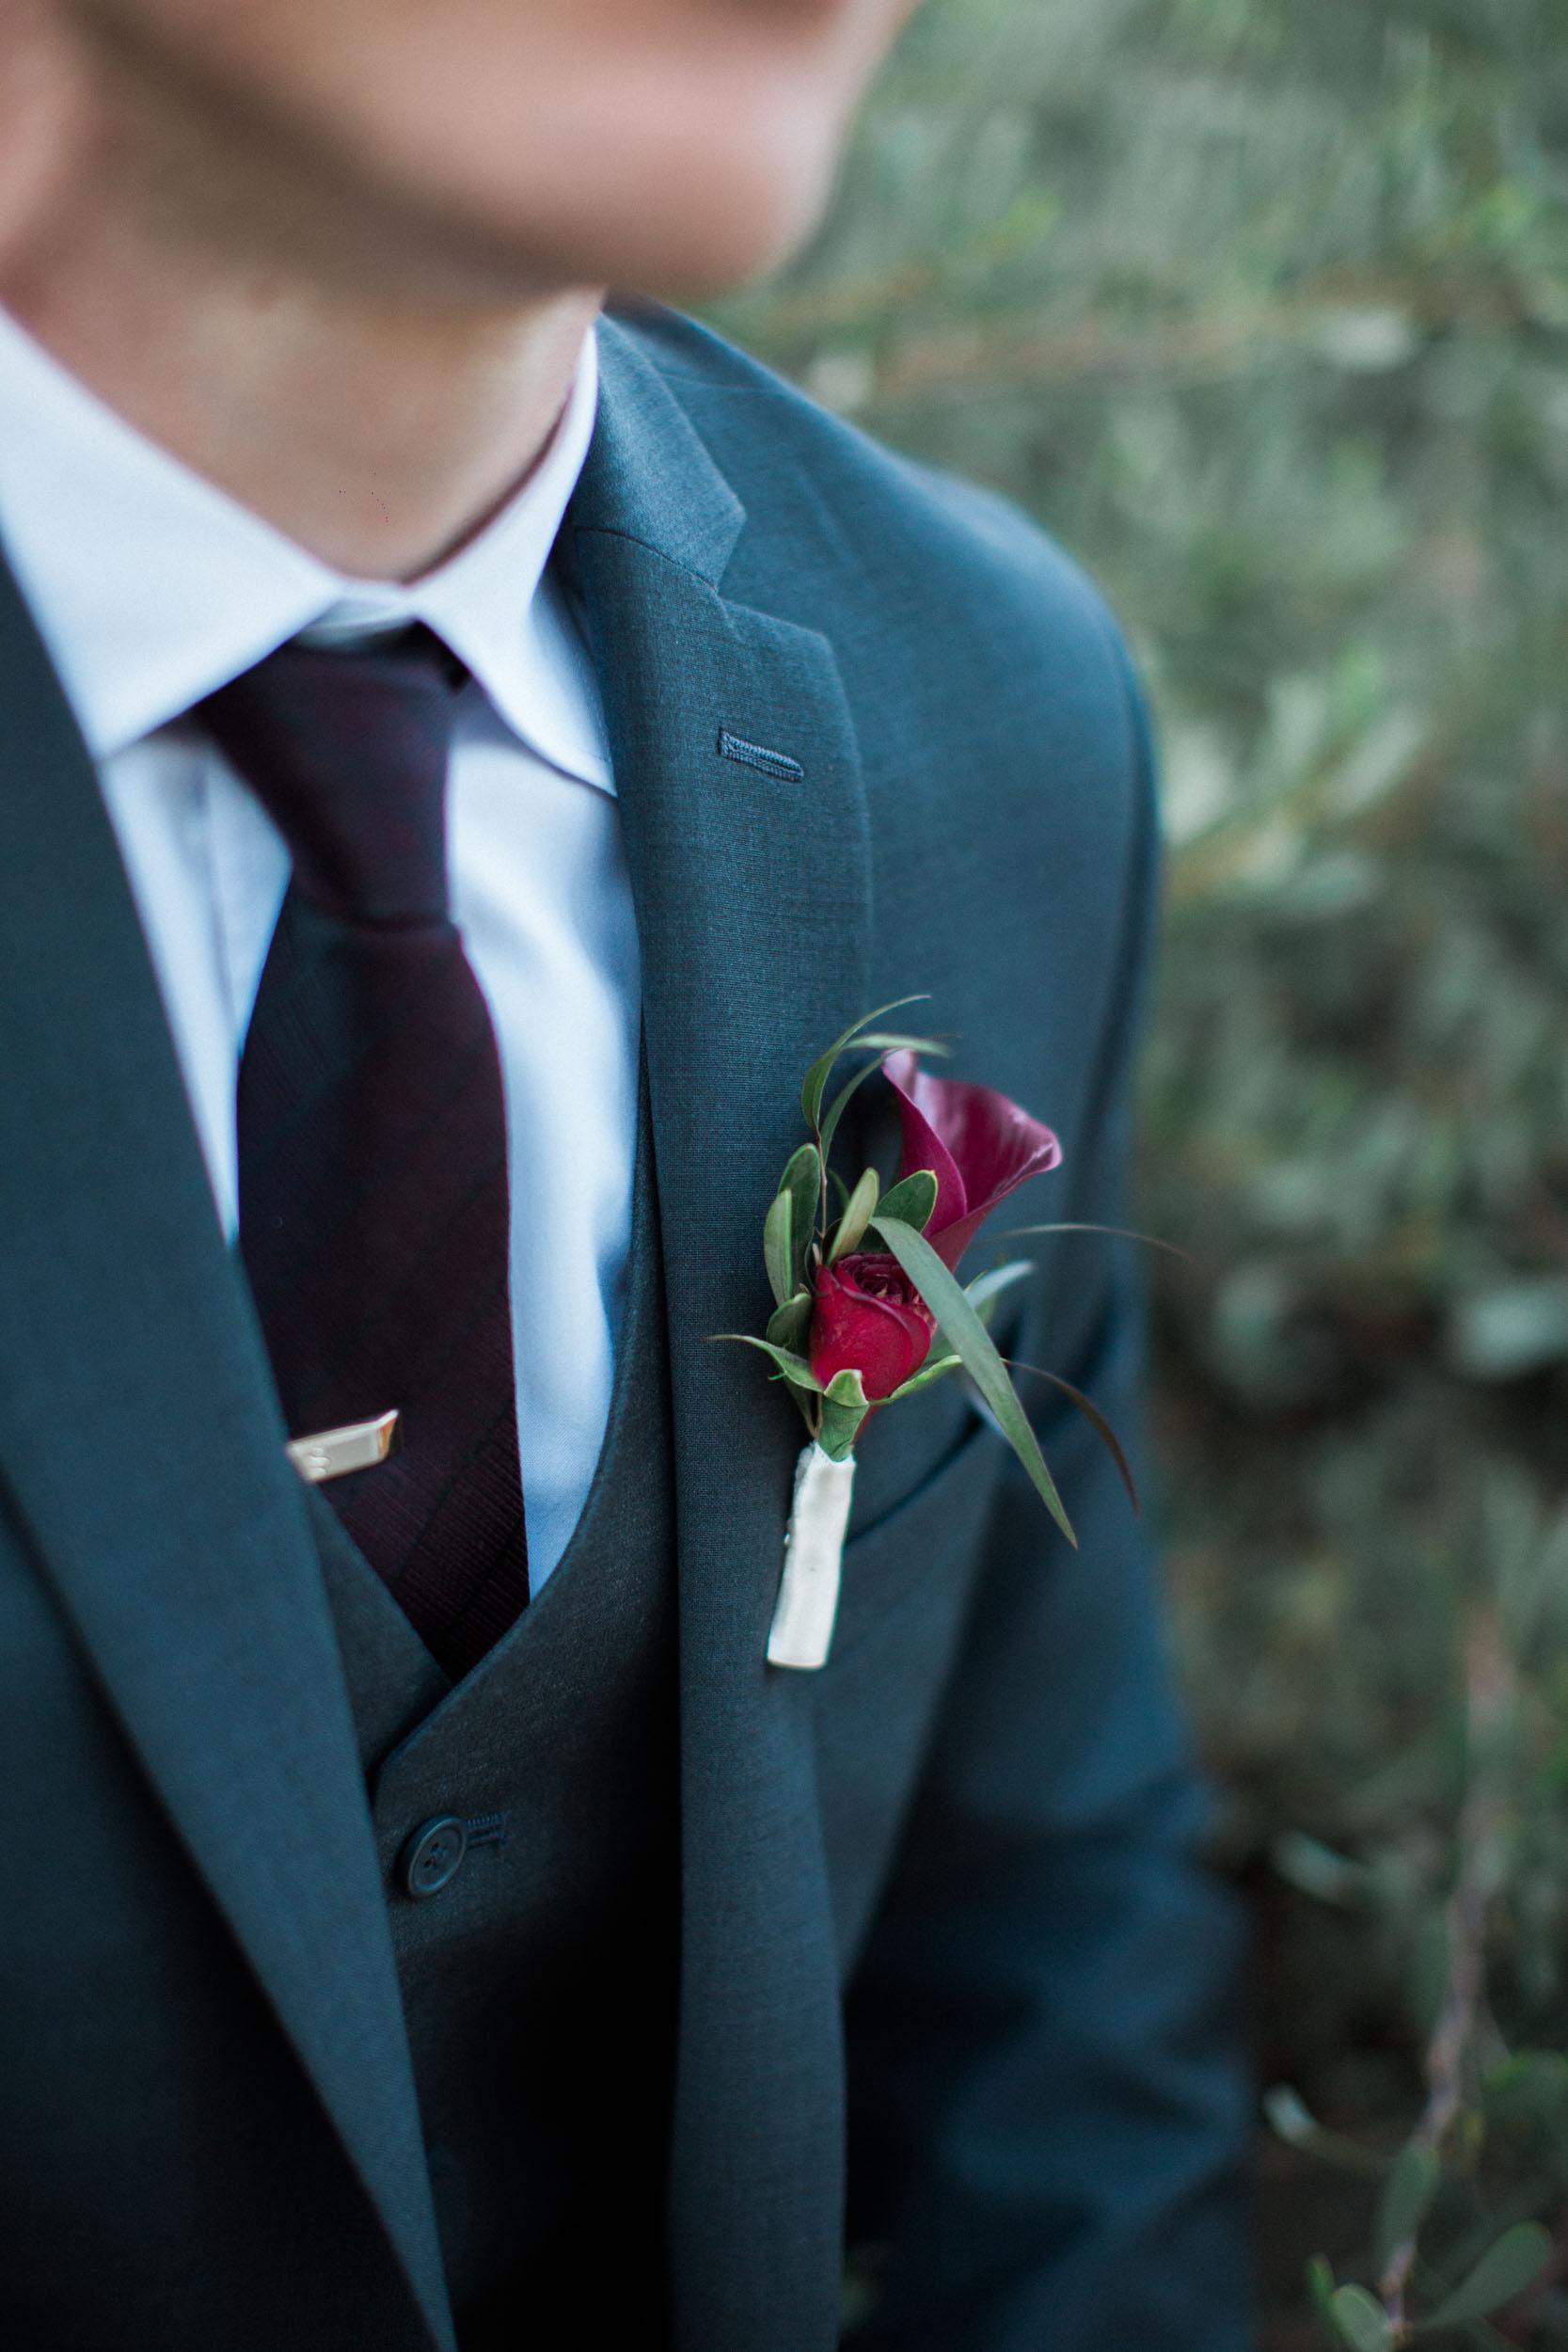 BKM-Photography-Highland-Park-Los-Angeles-Backyard-Wedding-0043.jpg